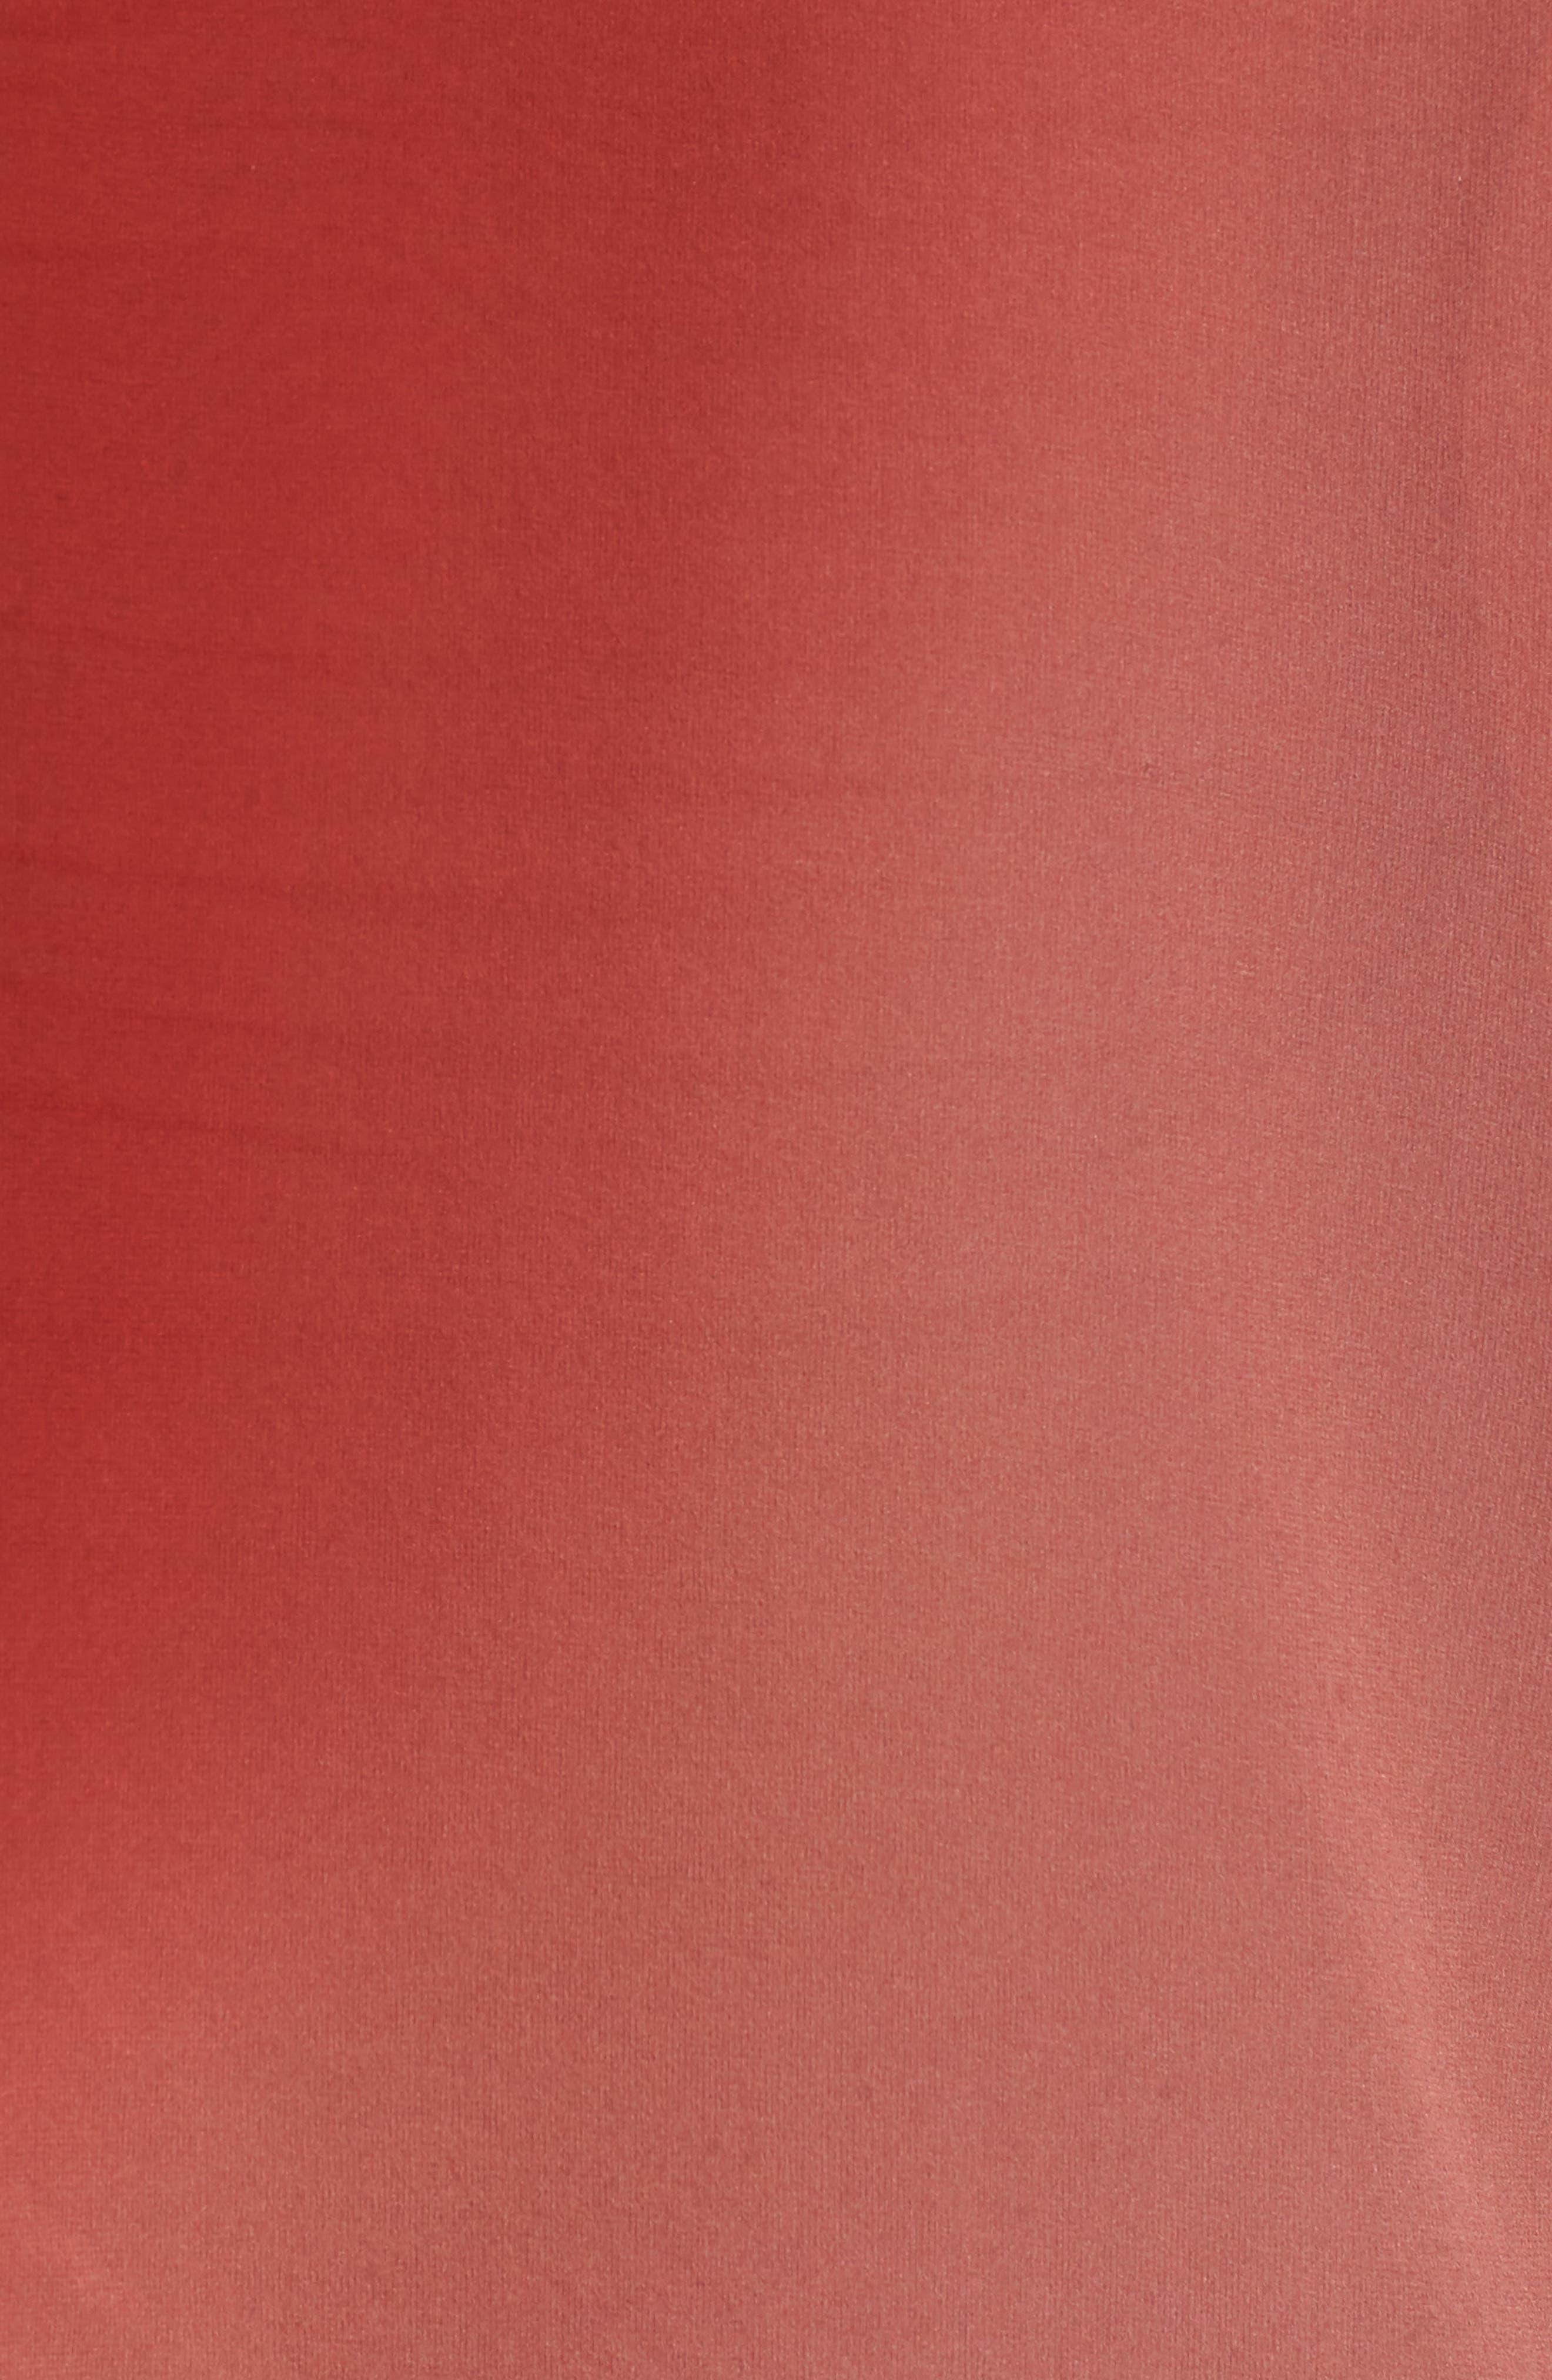 Ombré Silk Short Sleeve Top,                             Alternate thumbnail 5, color,                             643